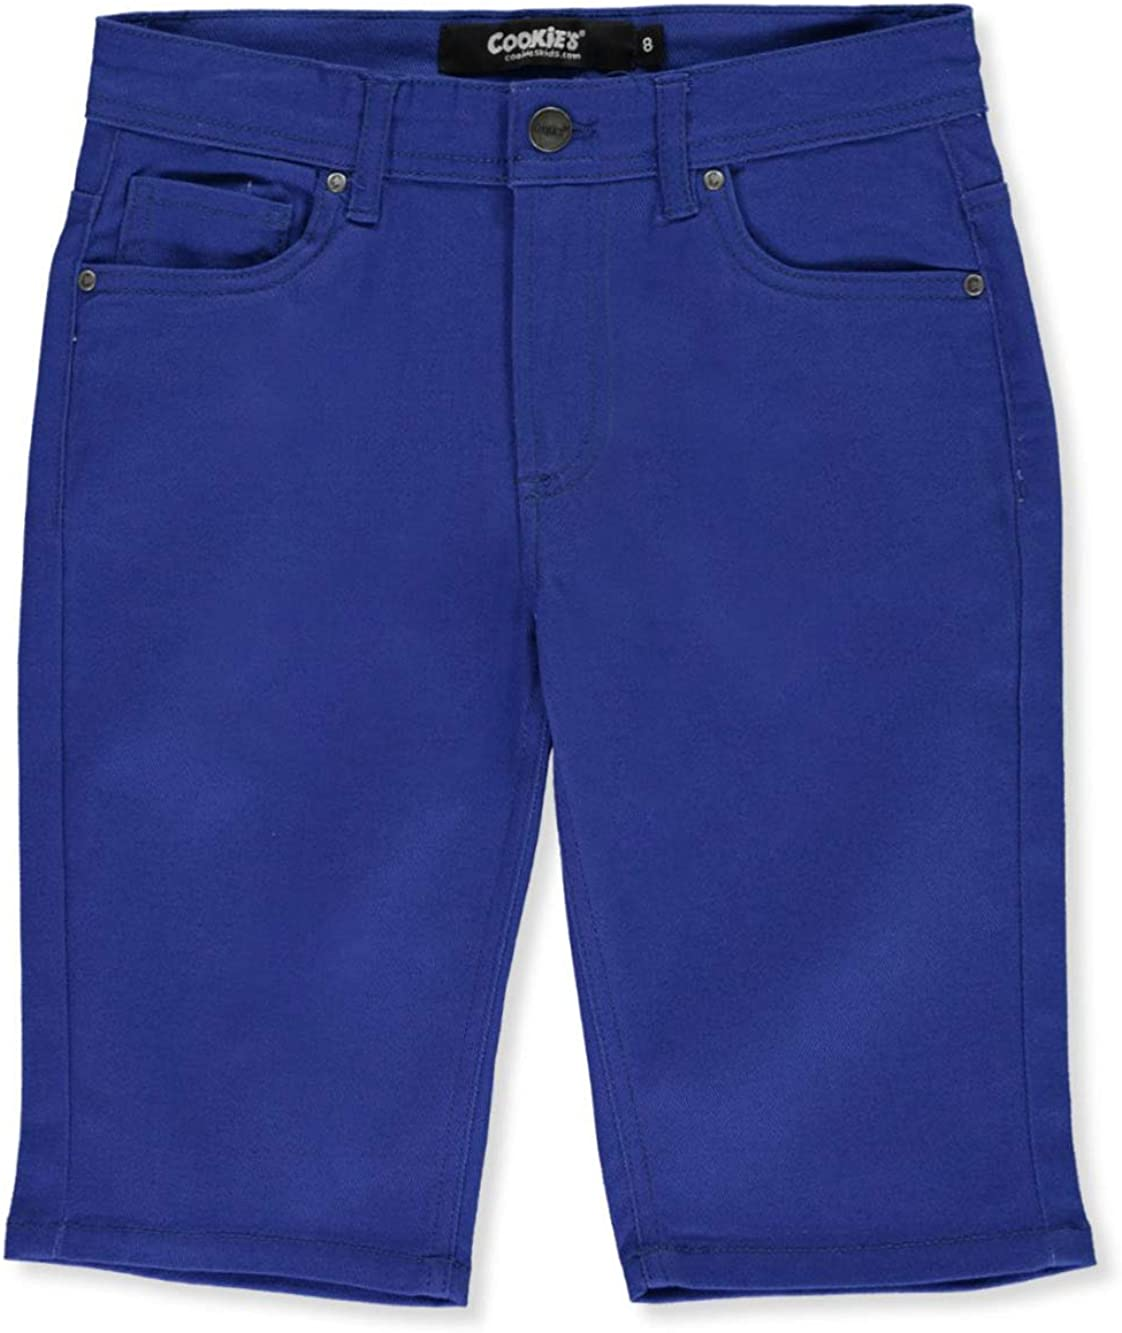 CDBApparel Cookies Boys Denim Shorts